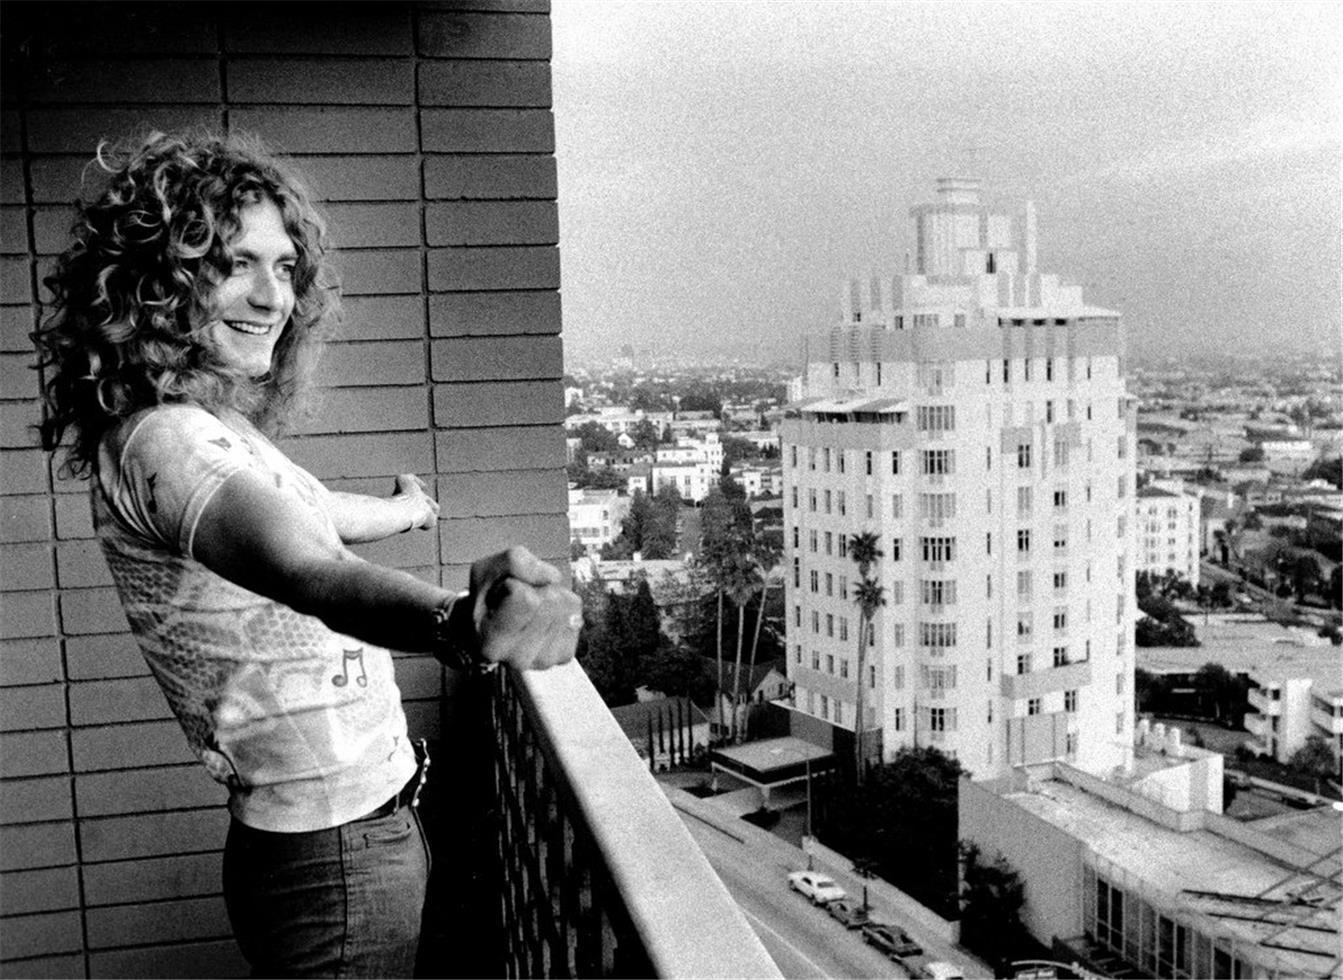 Robert Plant, Led Zeppelin, Sunset Strip, Los Angeles, CA, 1975